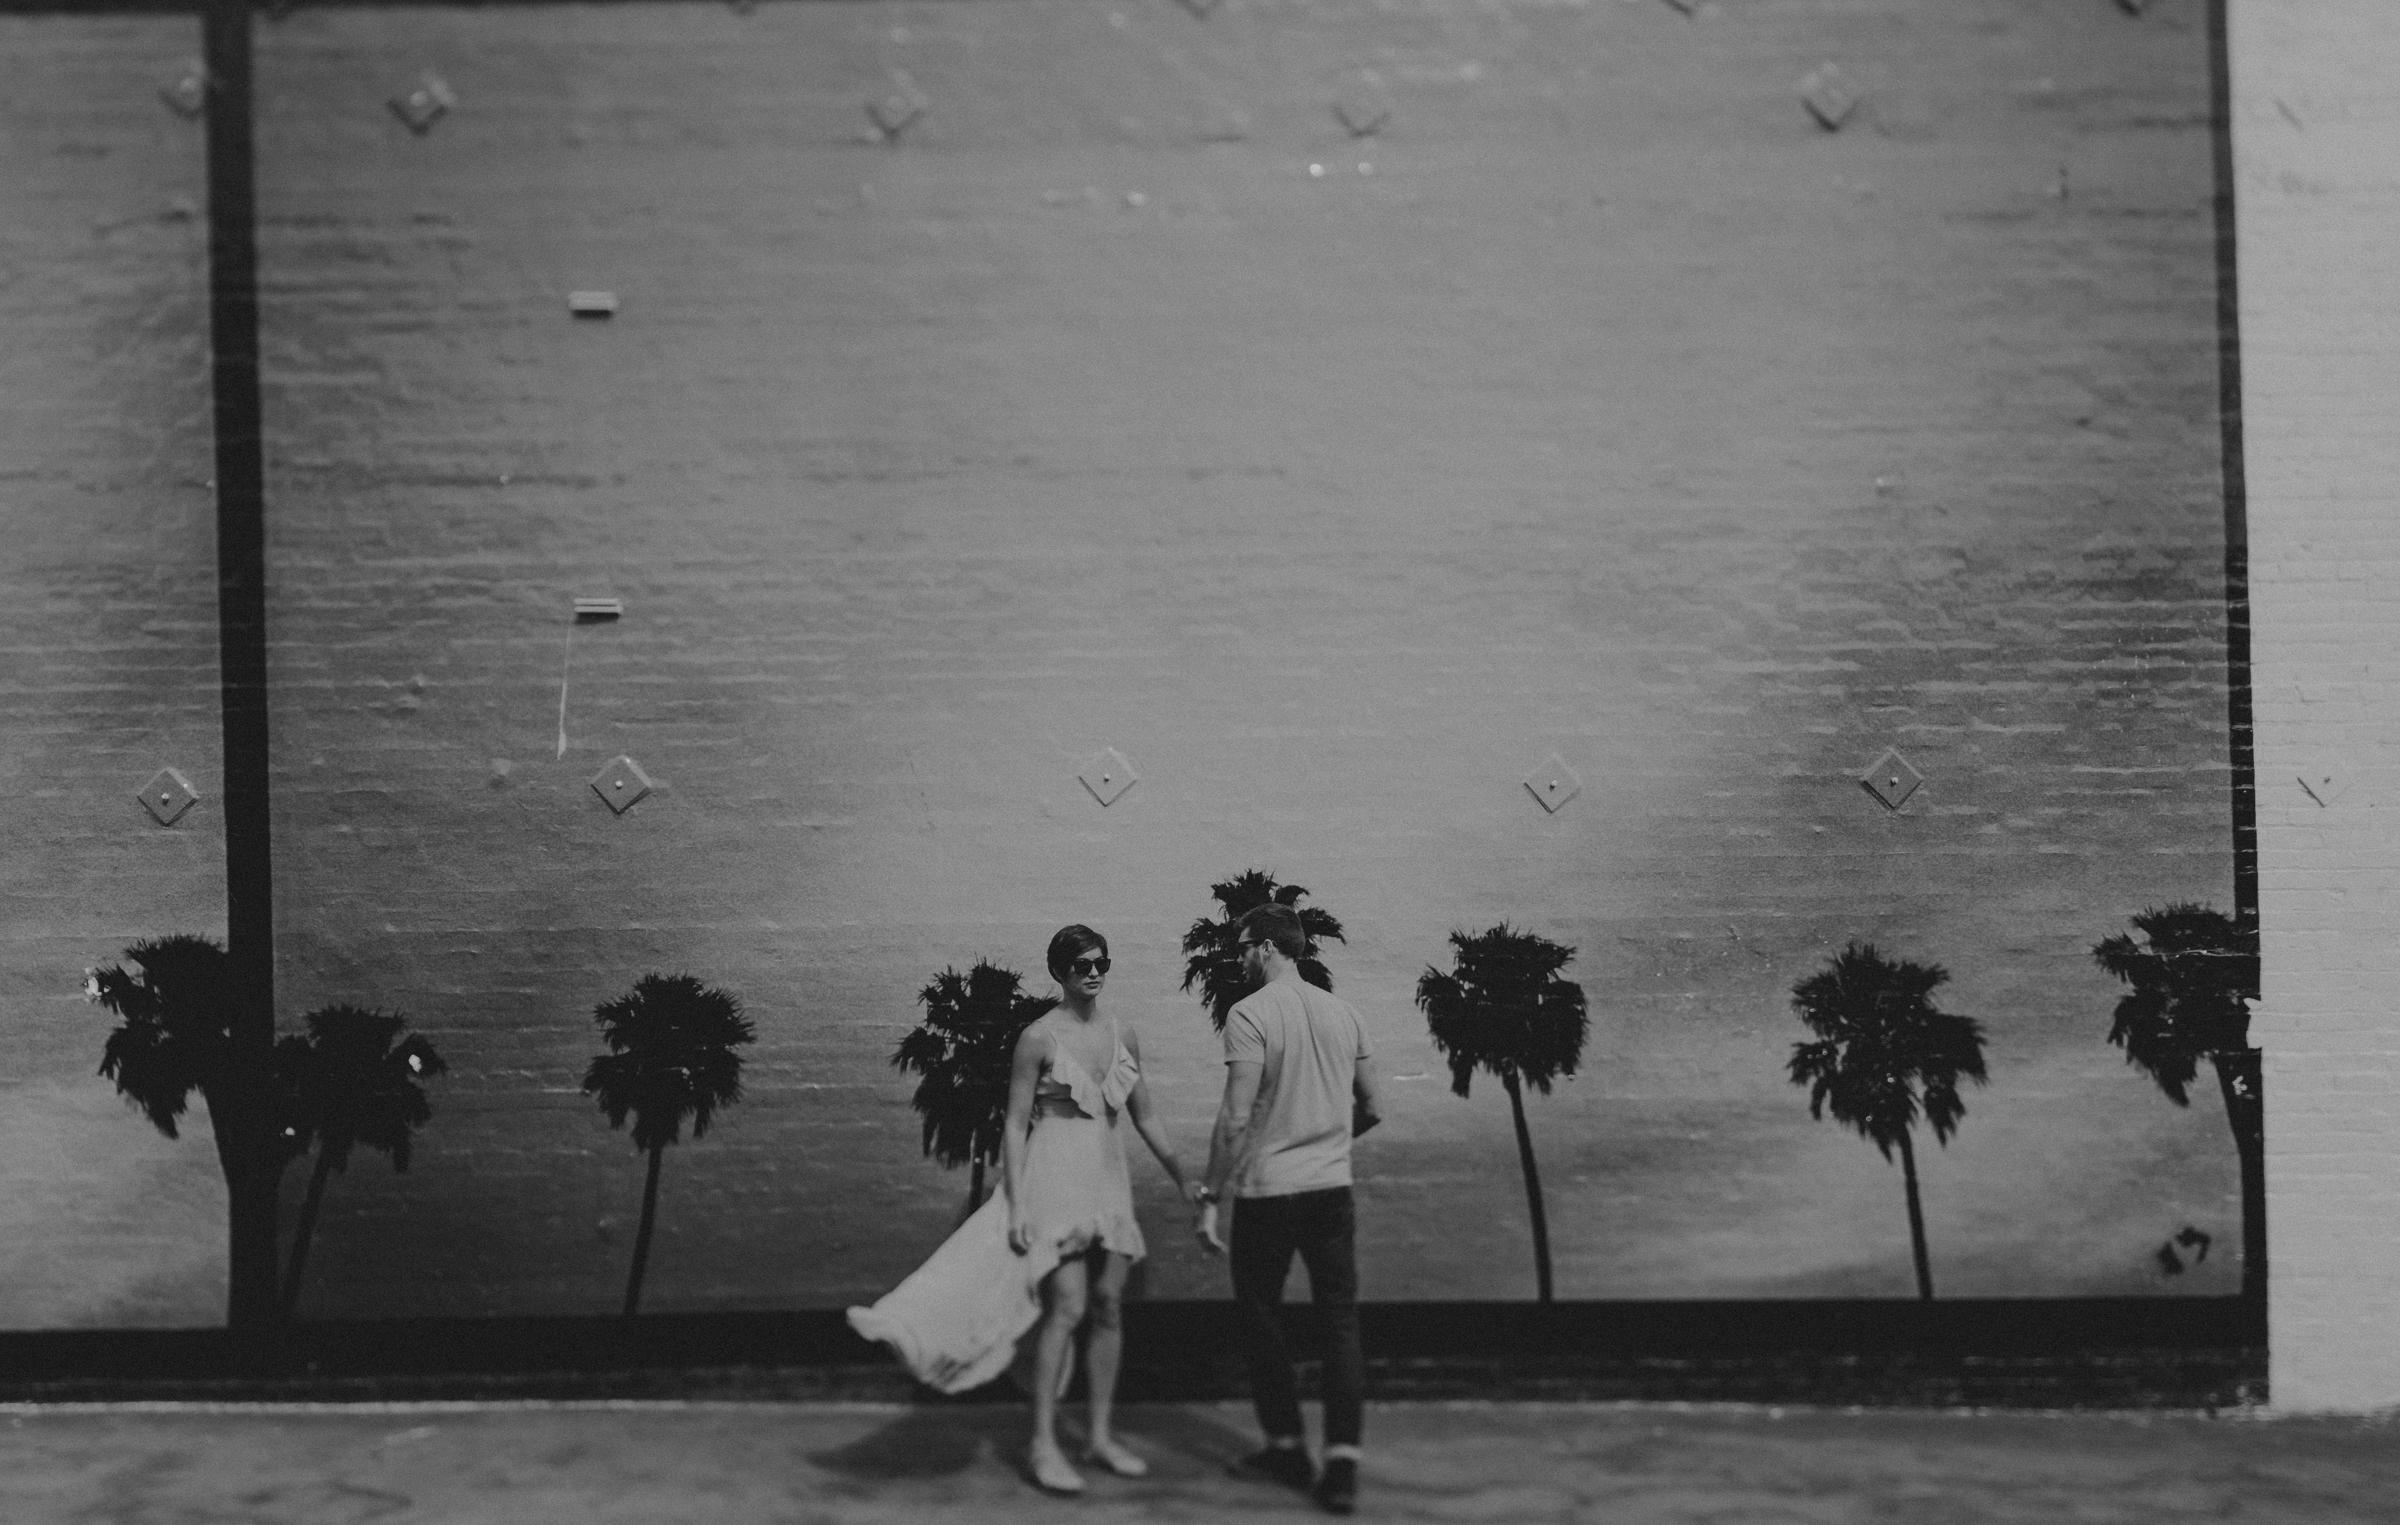 Isaiah + Taylor Photography - Venice Beach & Santa Monica Engagement Session, Los Angeles Wedding Photographer-024.jpg